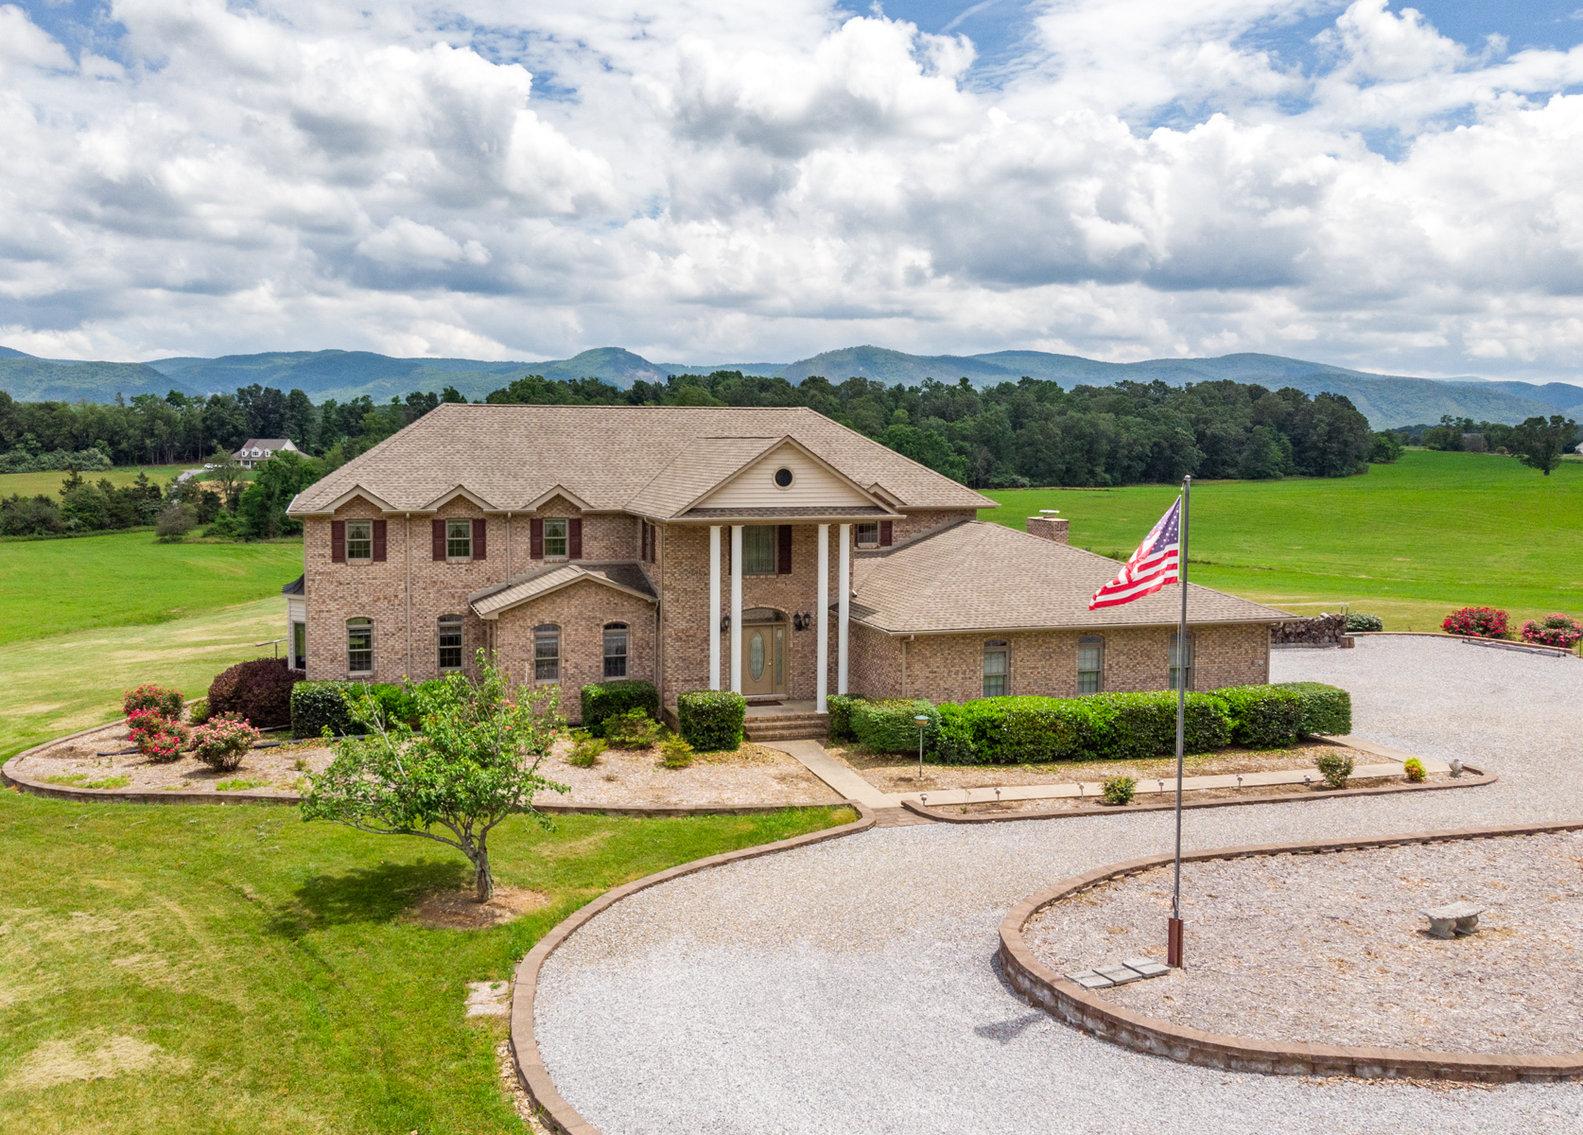 Custom 3 BR/3 BA Home on 14.5 +/- Acres w/Amazing Blue Ridge Mountain Views--Augusta County, VA